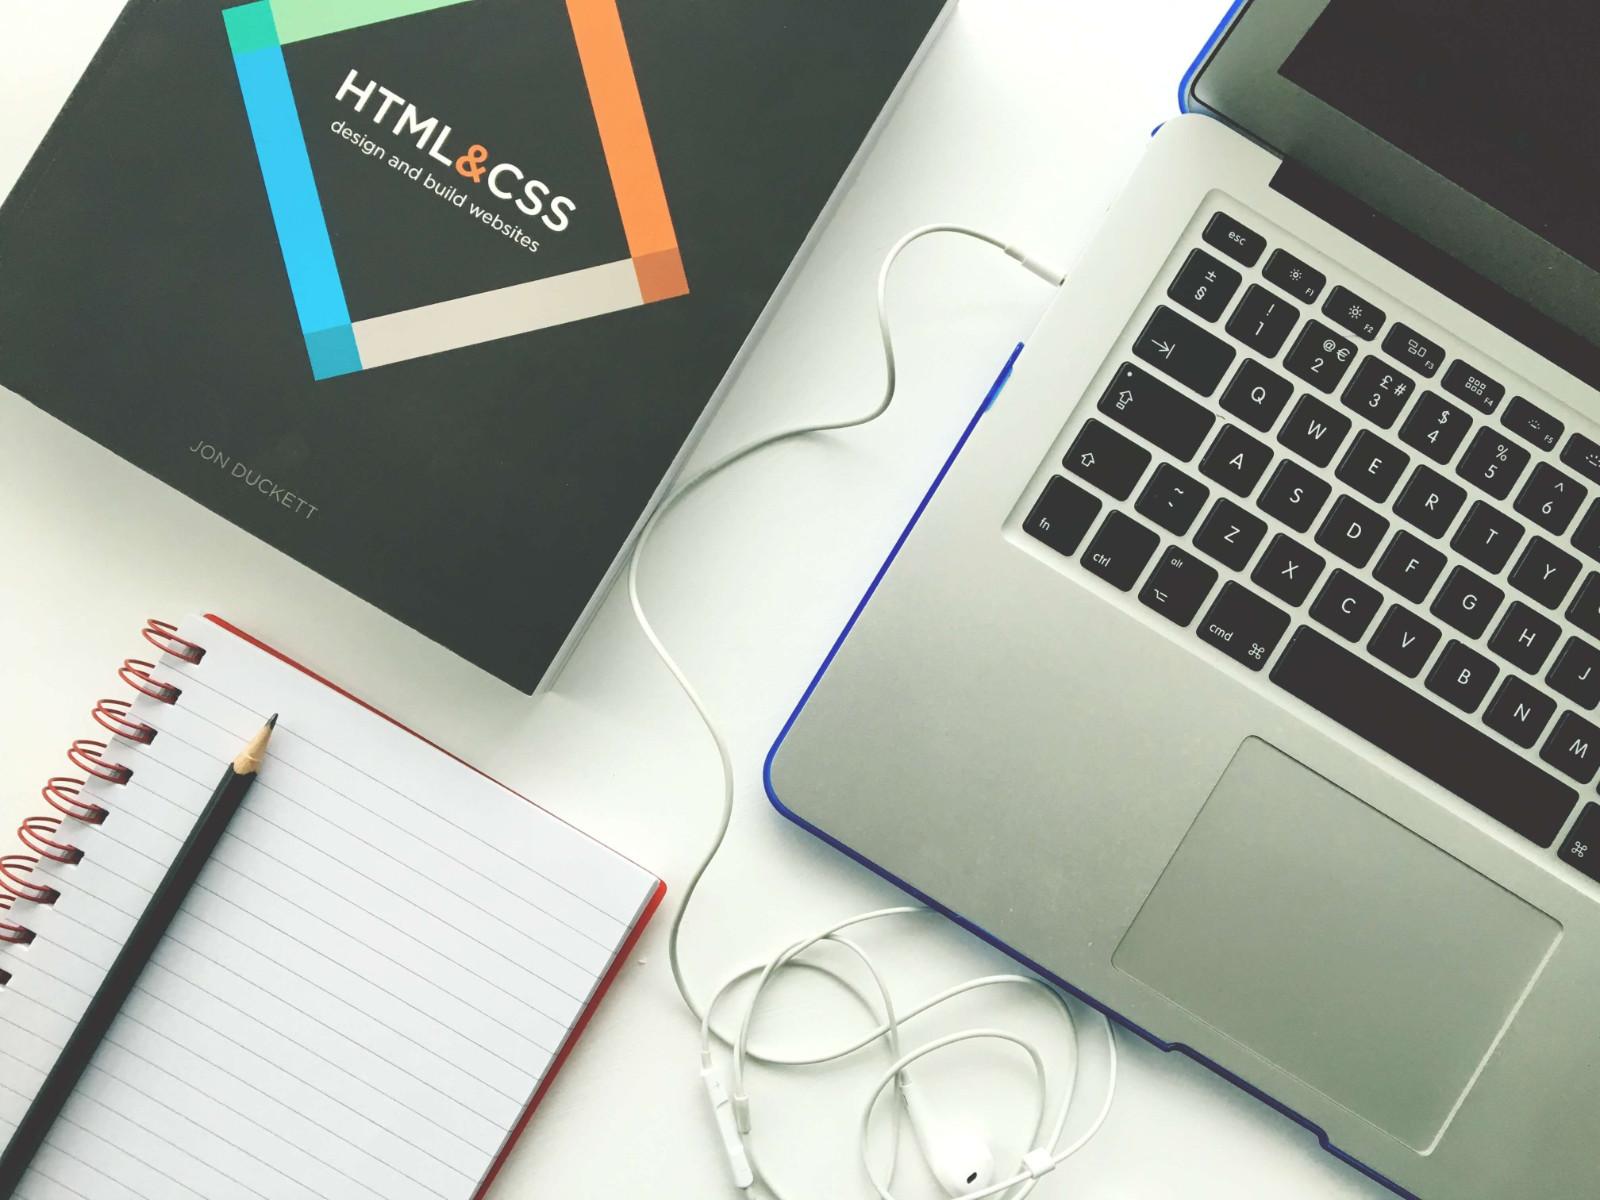 design-development-electronics-326424